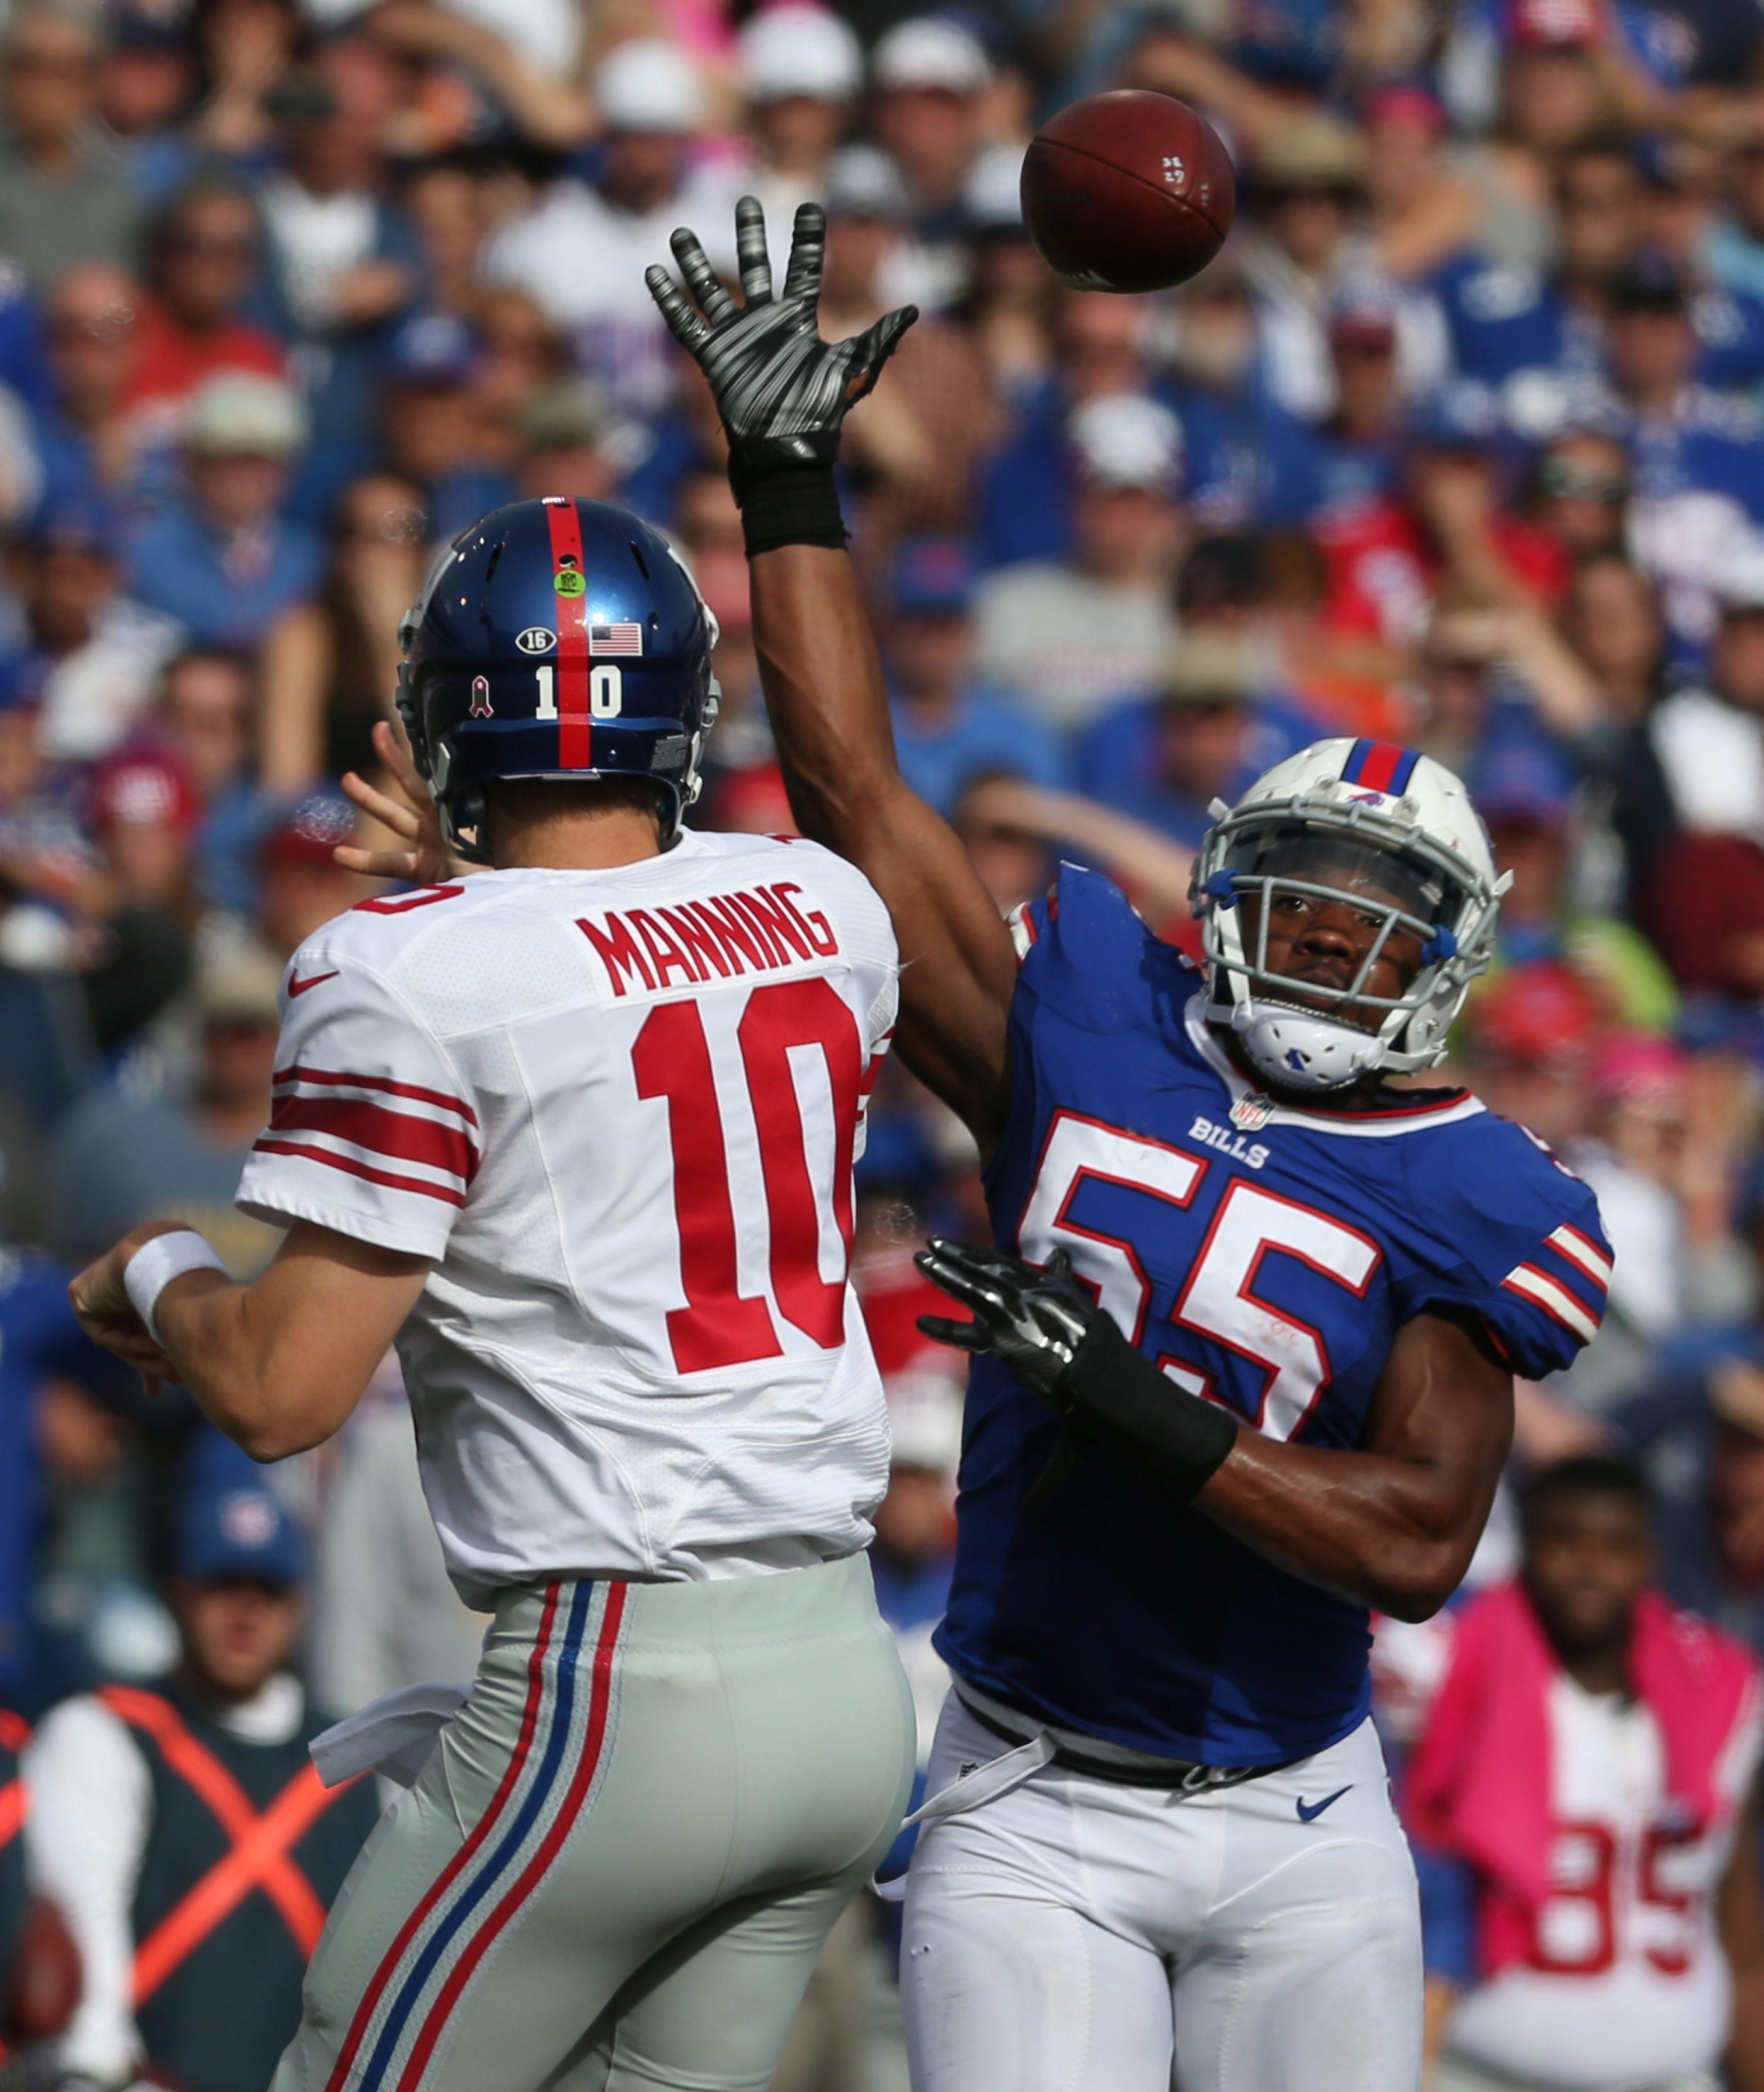 Buffalo Bills outside linebacker Jerry Hughes (55) pressures New York Giants quarterback Eli Manning. (James P. McCoy/Buffalo News)